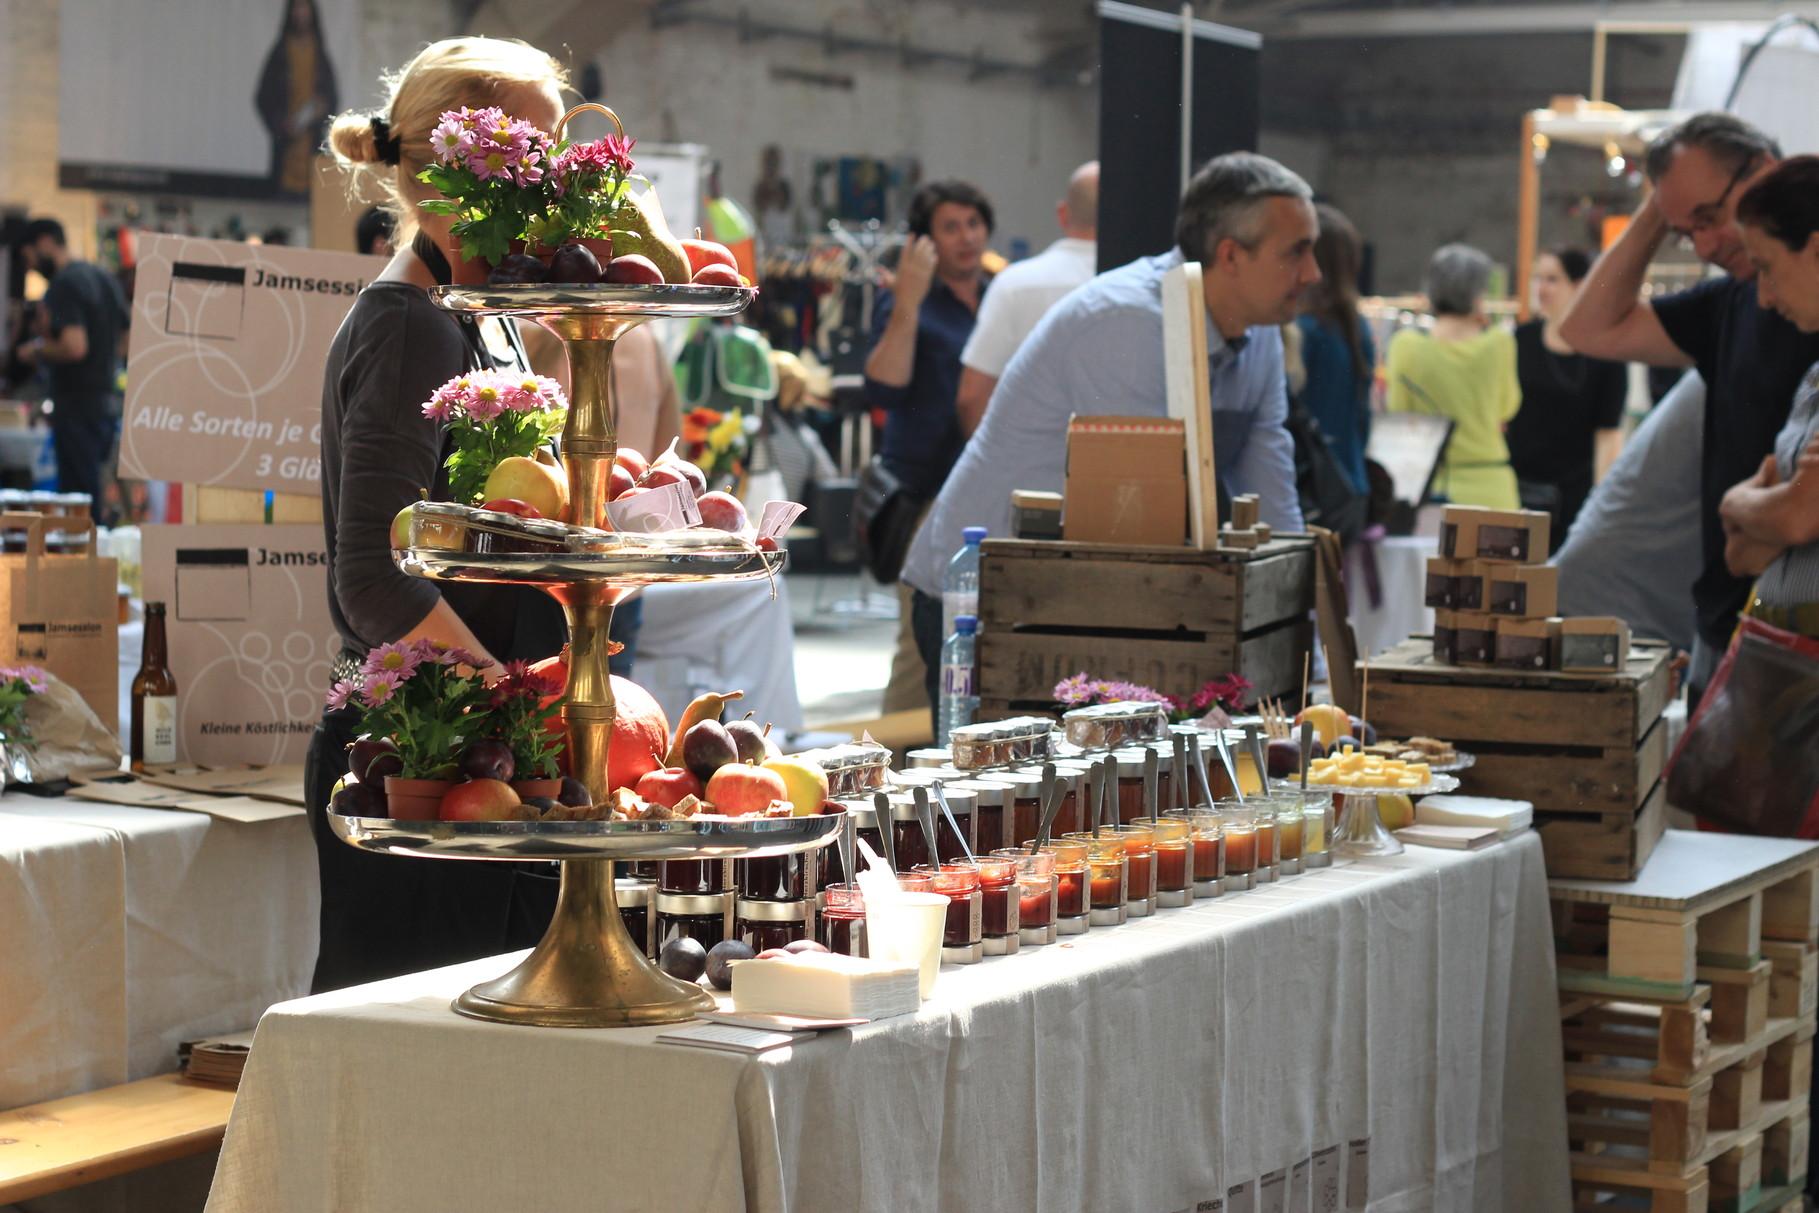 Edelstoff Markt in Wien